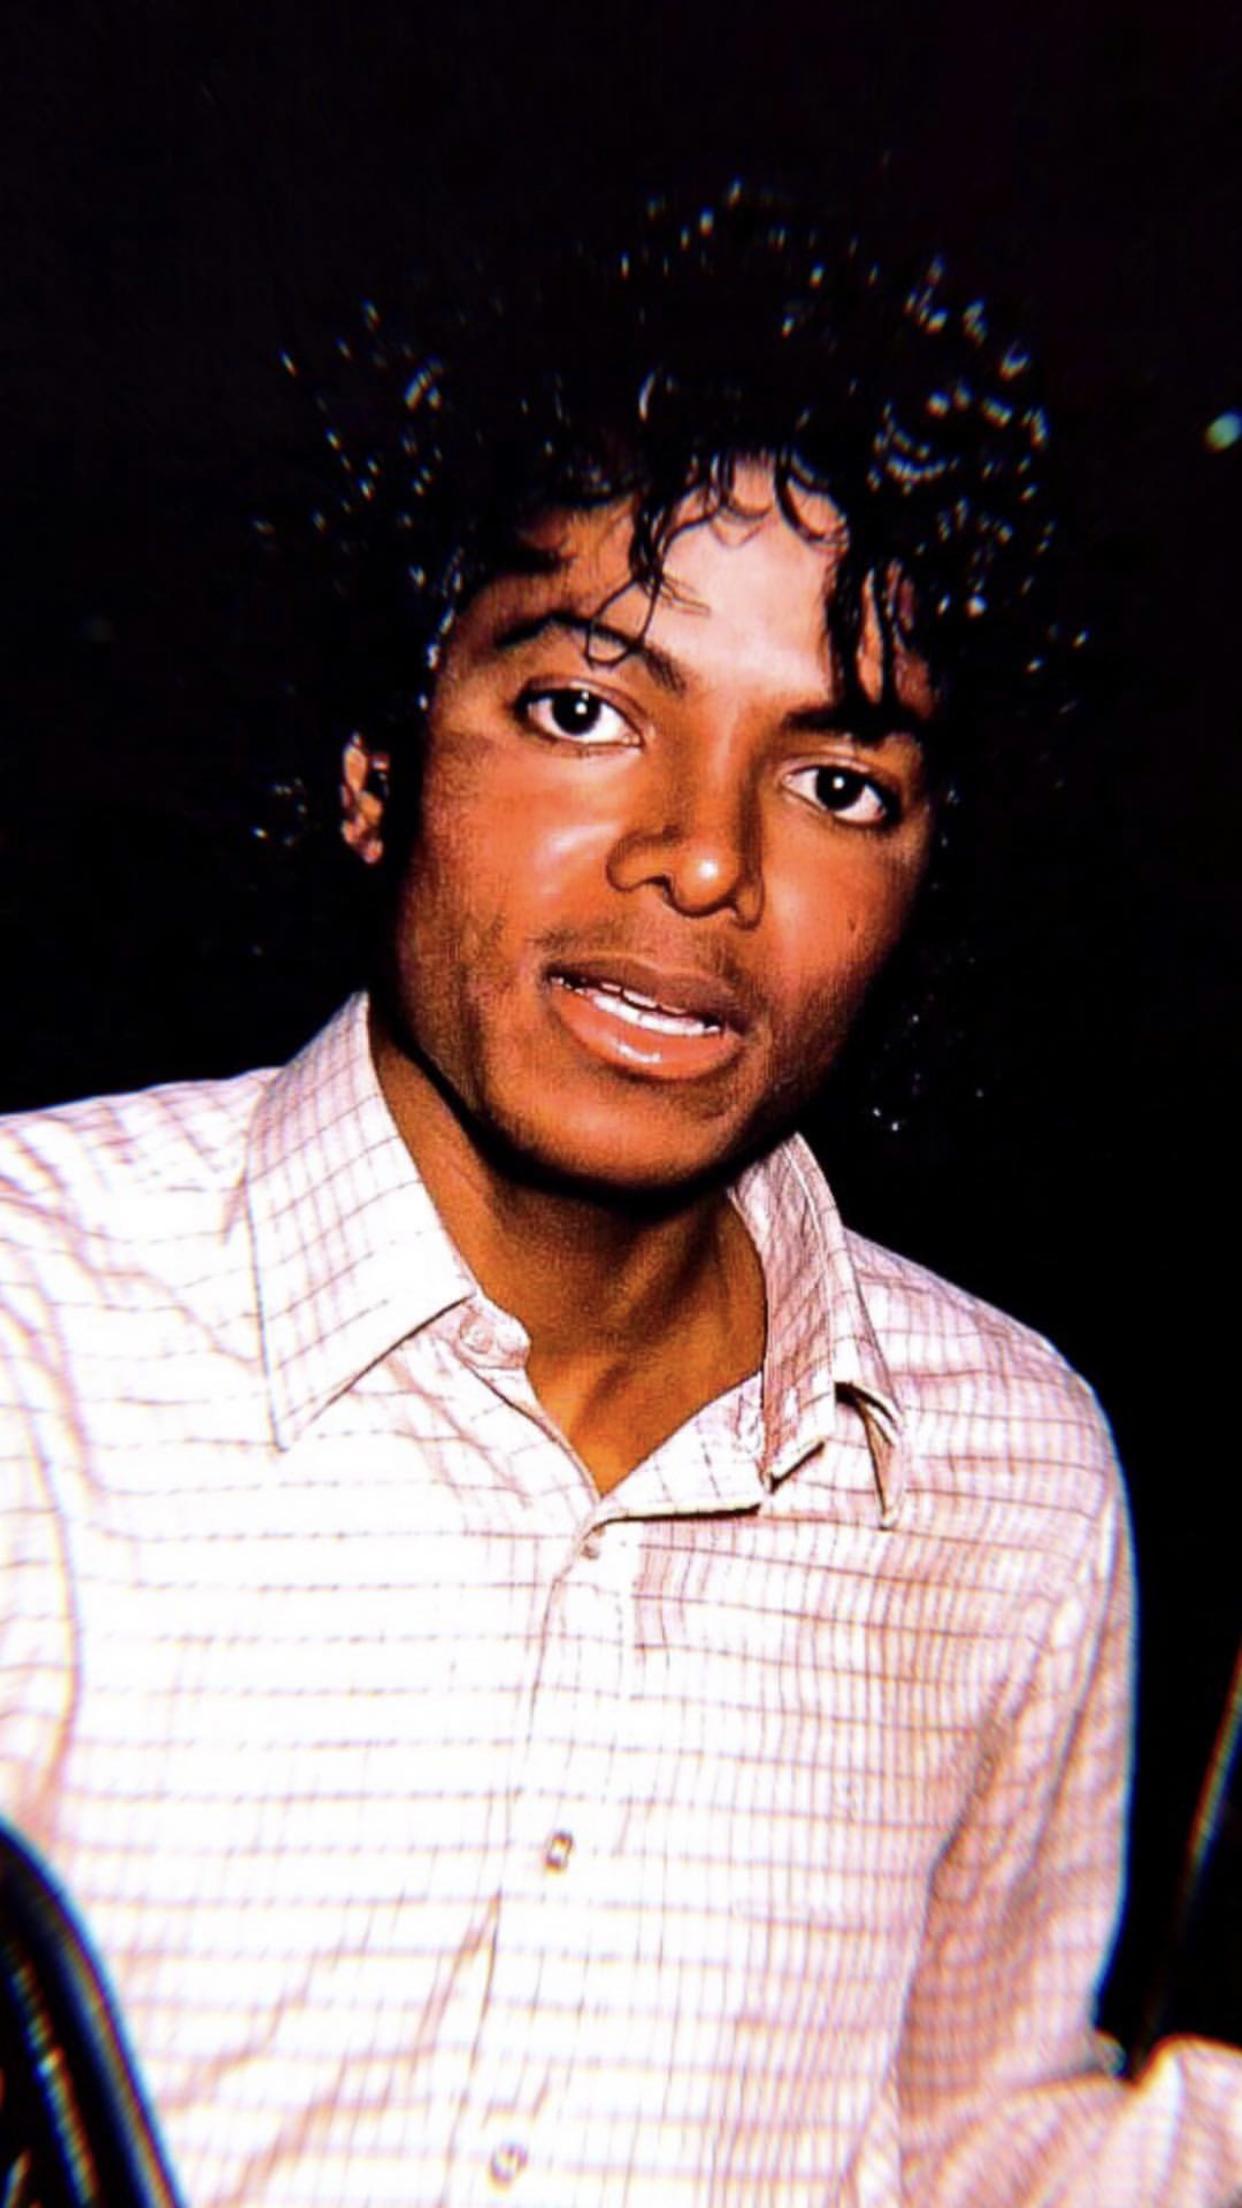 Thriller Era Wallpaper Michael Jackson Michael Jackson Thriller Michael Jackson Pics Michael Jackson